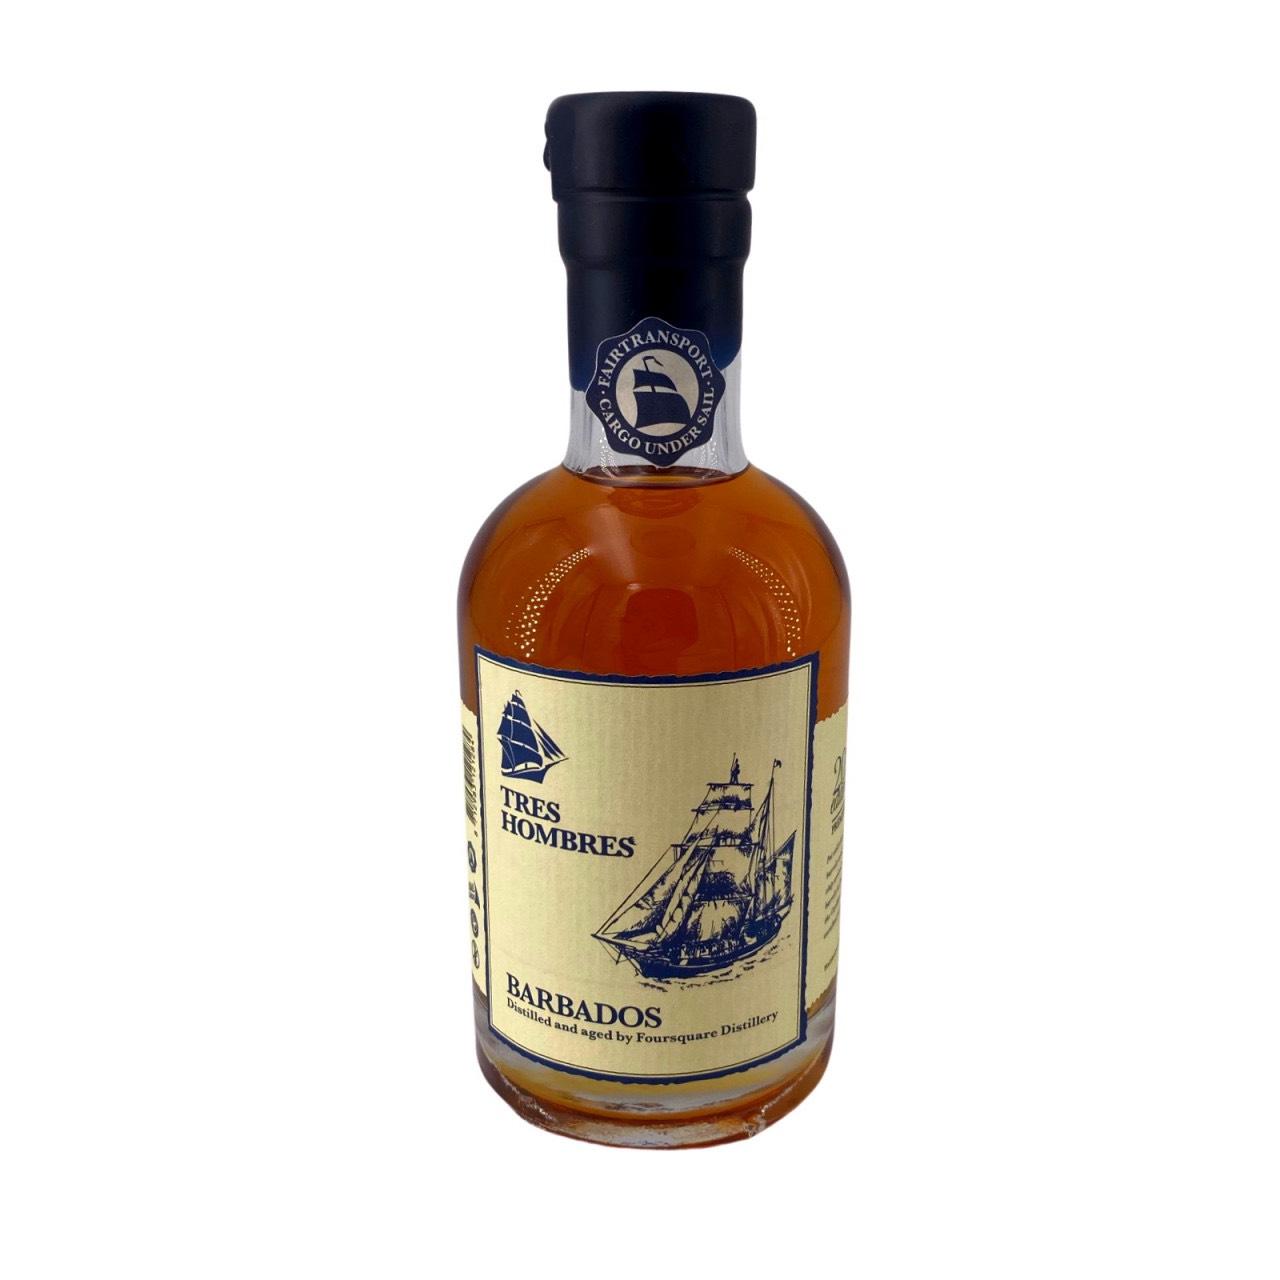 Bottle image of Ed. 39 Barbados